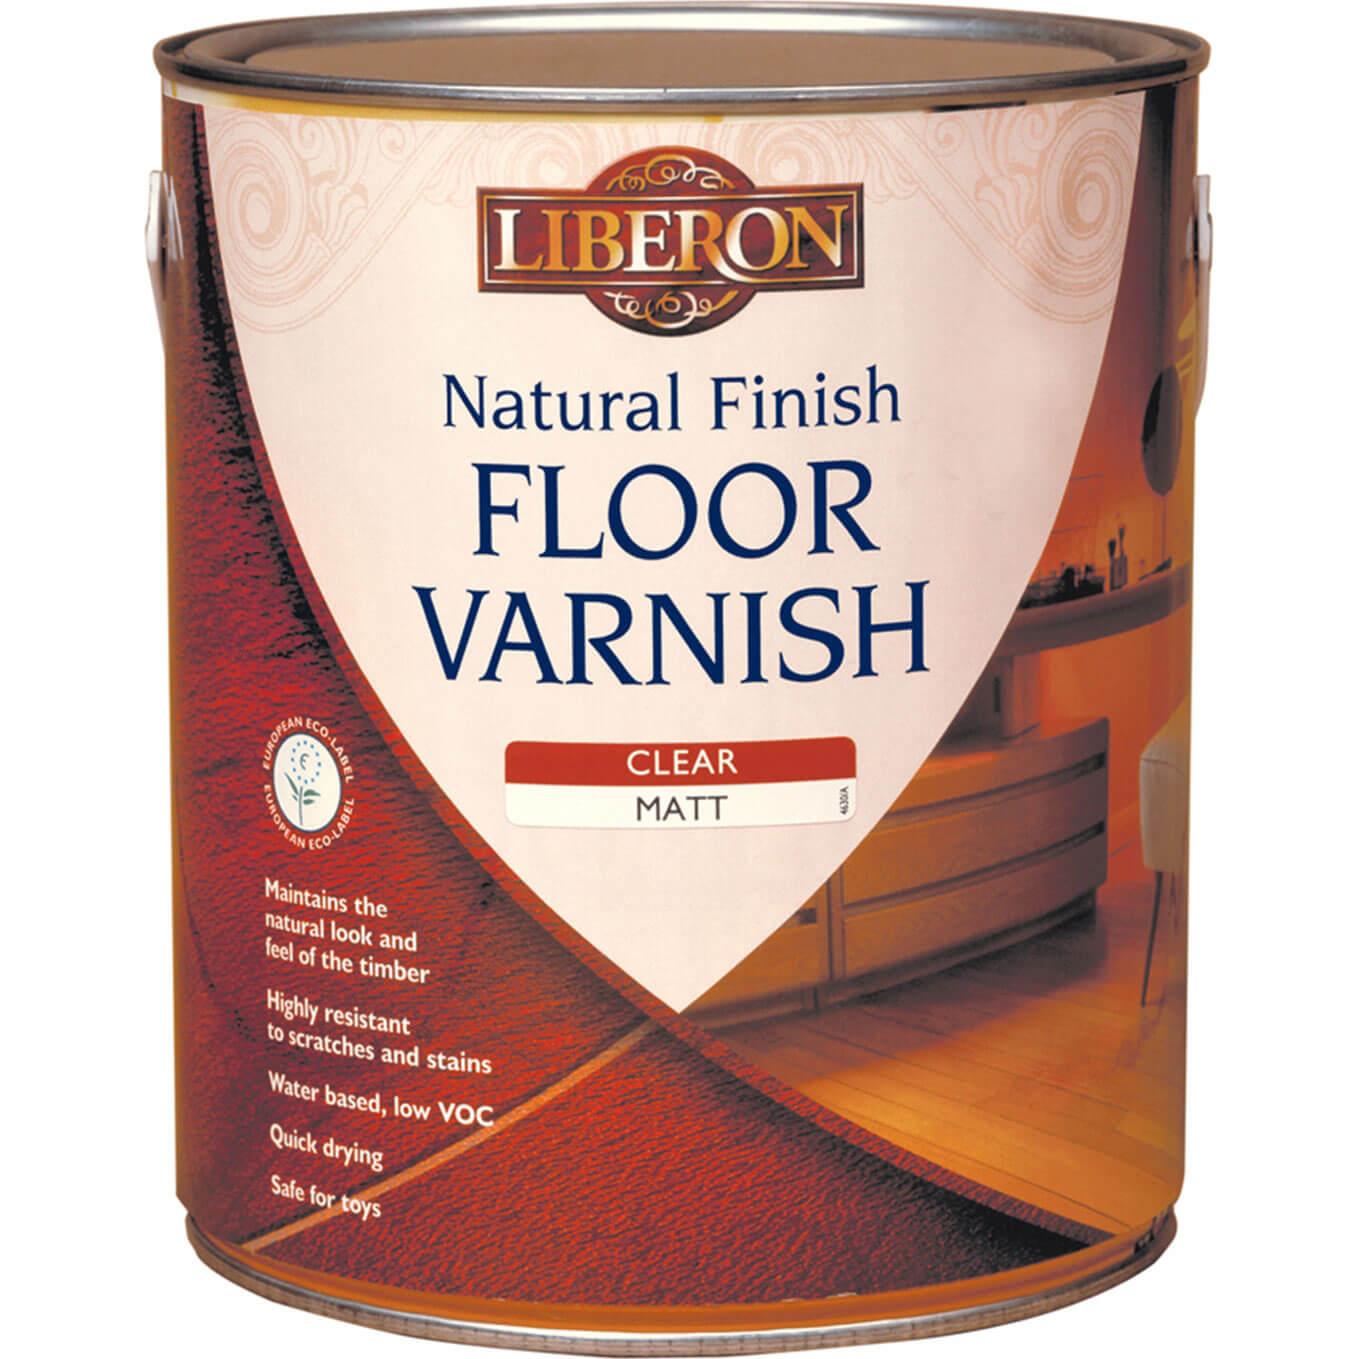 Image of Liberon Natural Finish Floor Varnish 2.5l Clear Matt